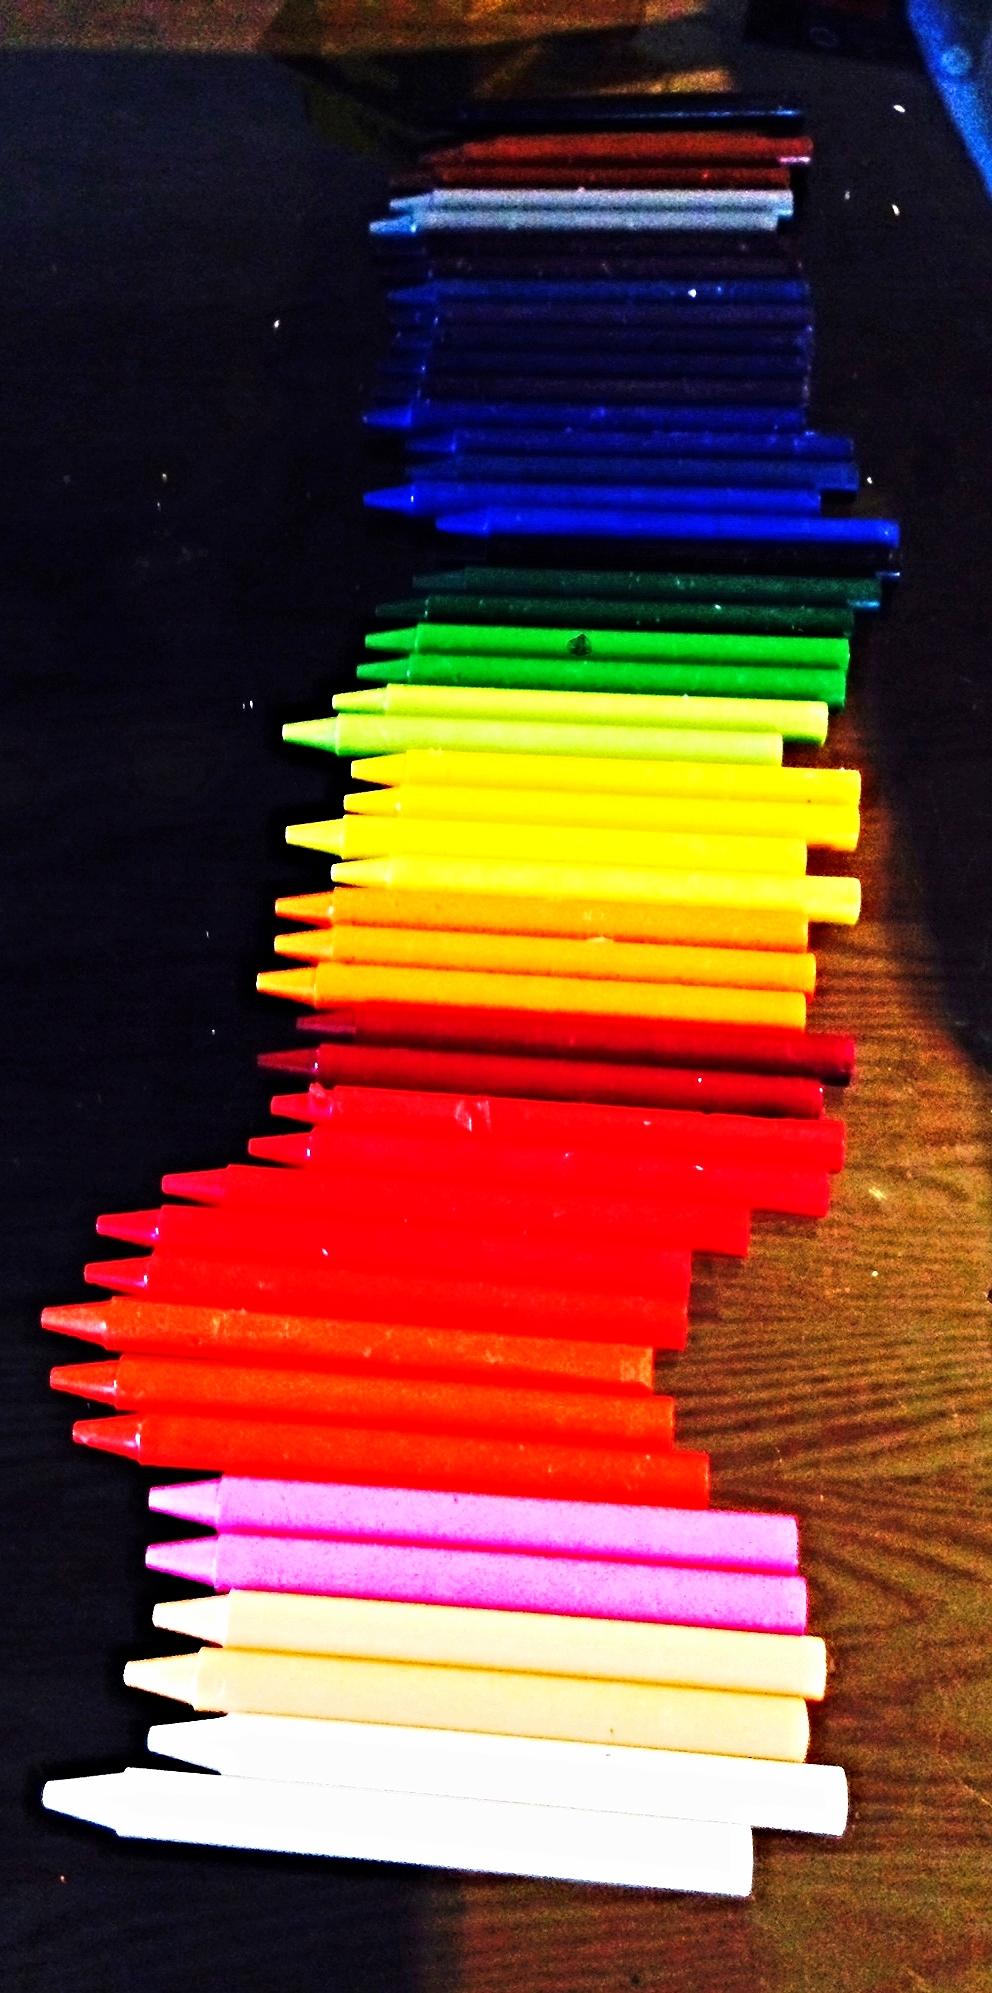 unwrapped crayons2.jpg